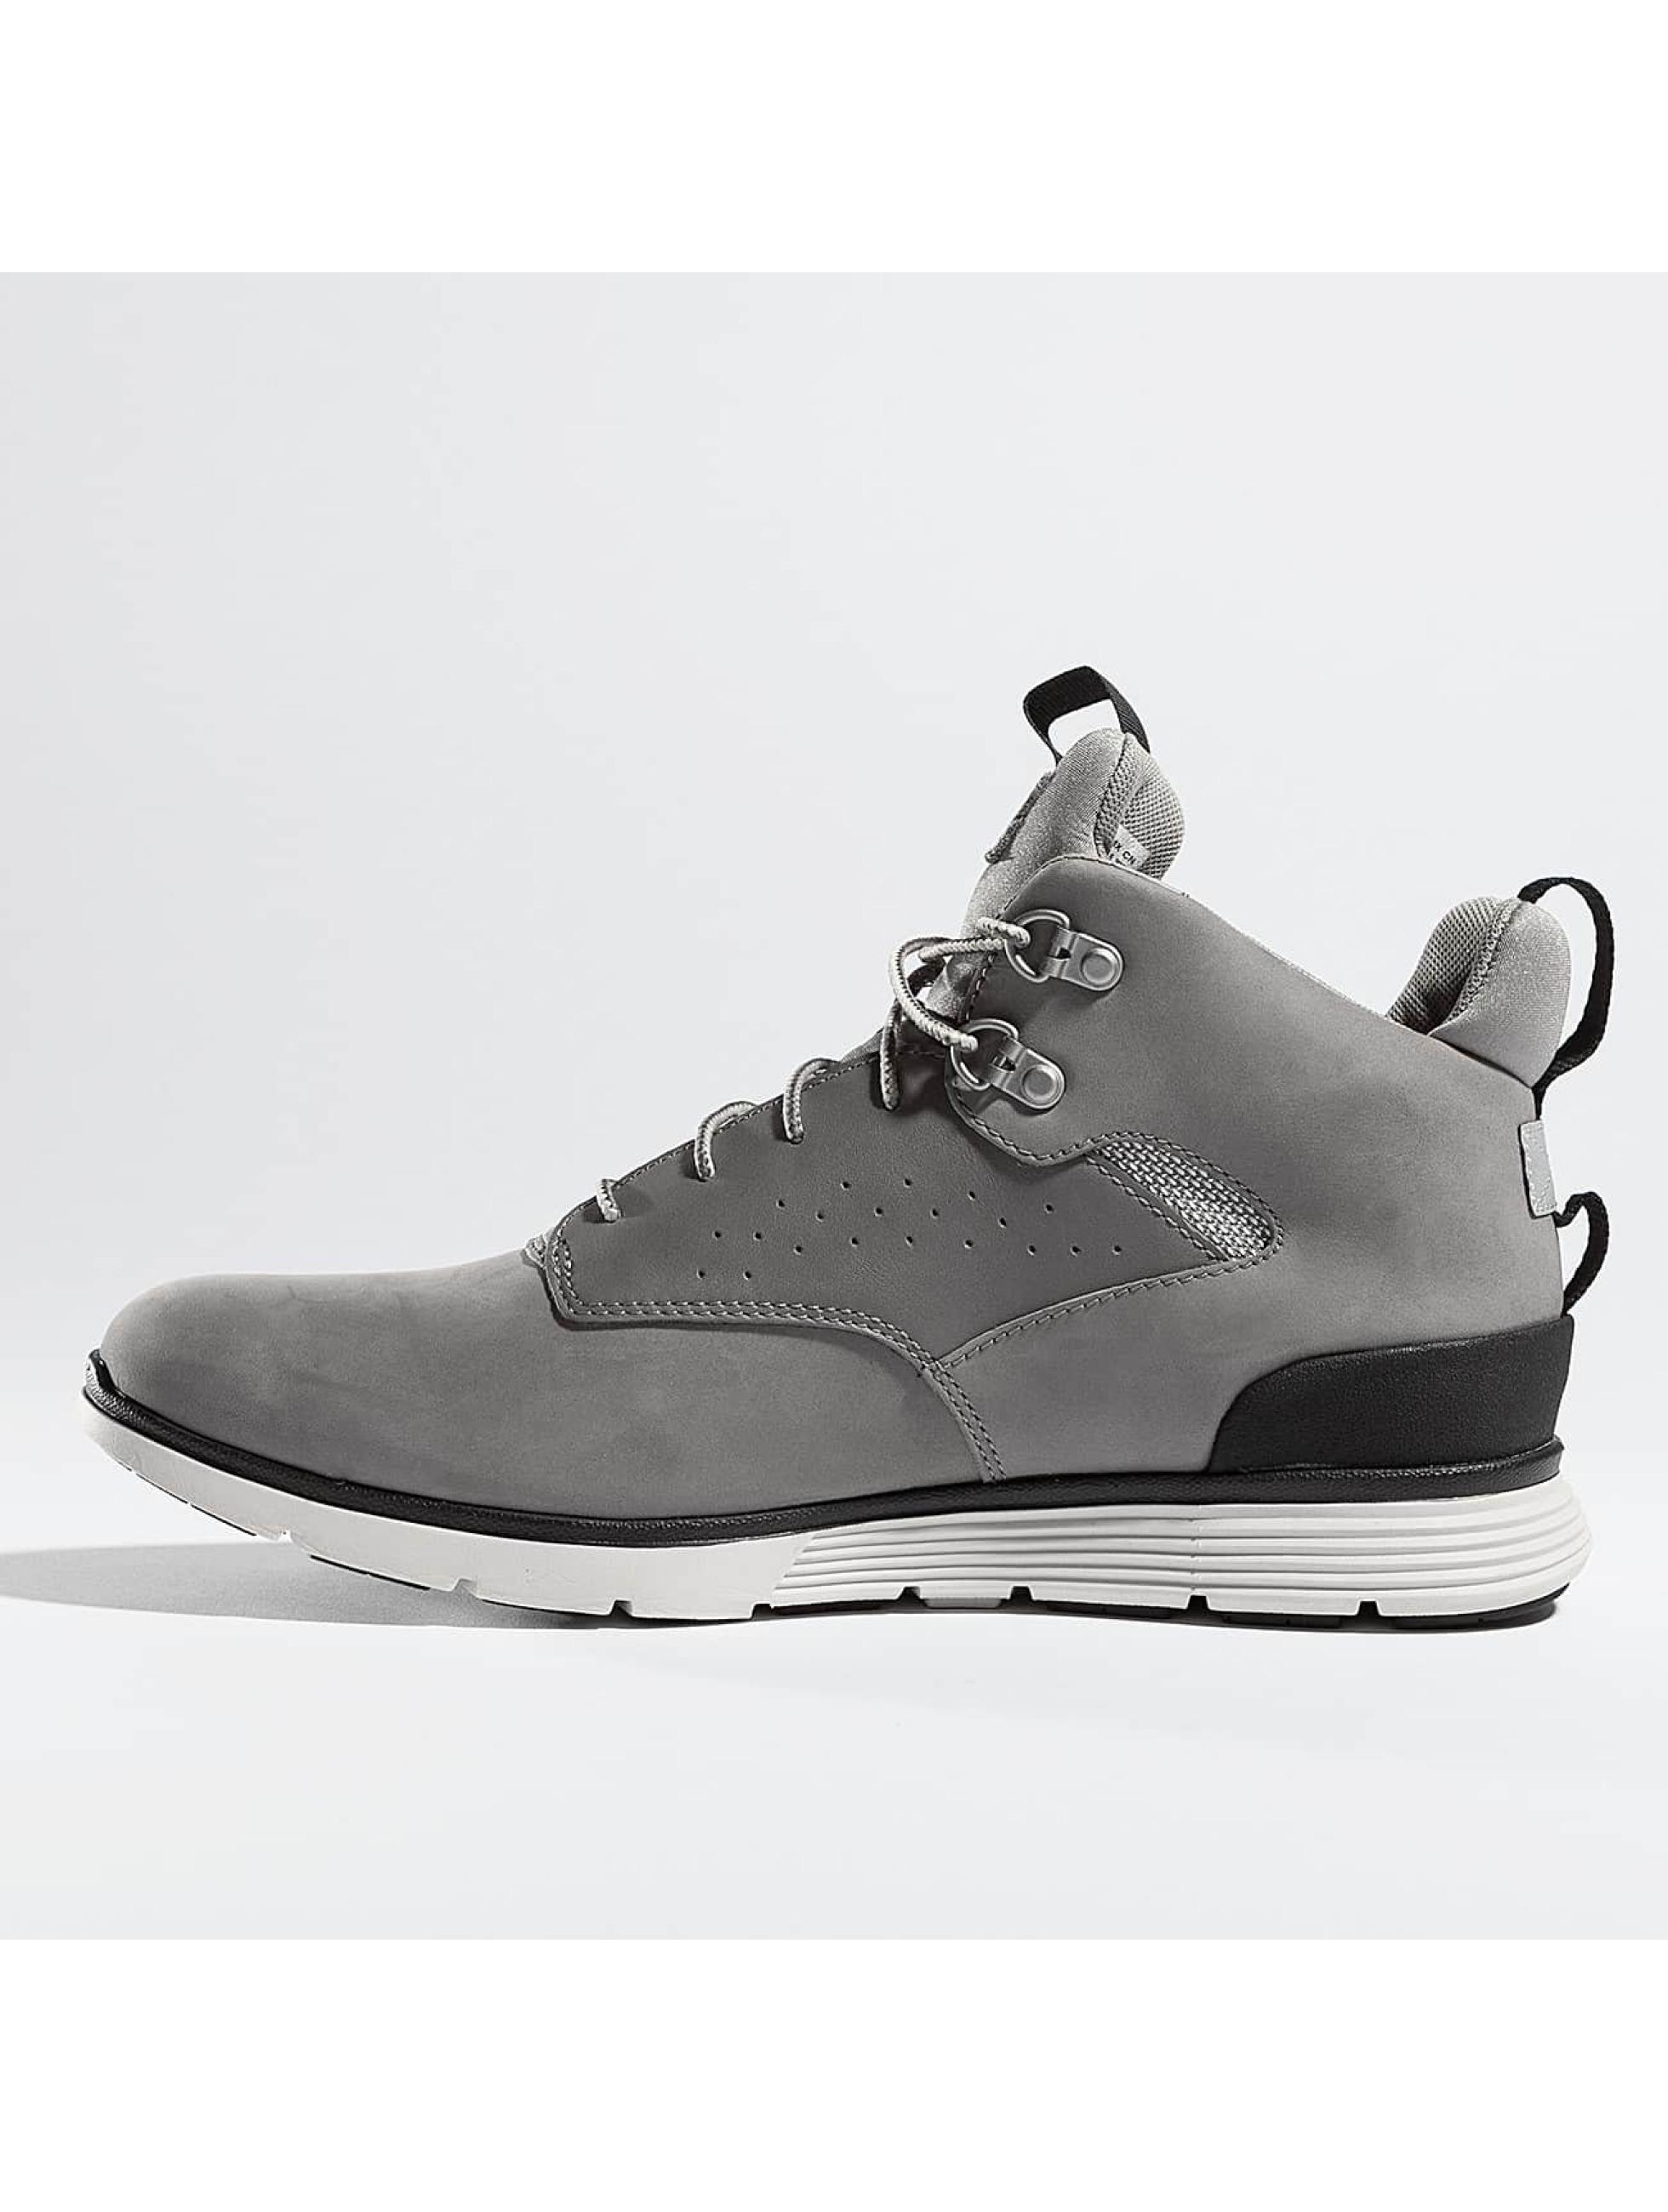 Timberland Sneakers Killington Hiker Chukka grey